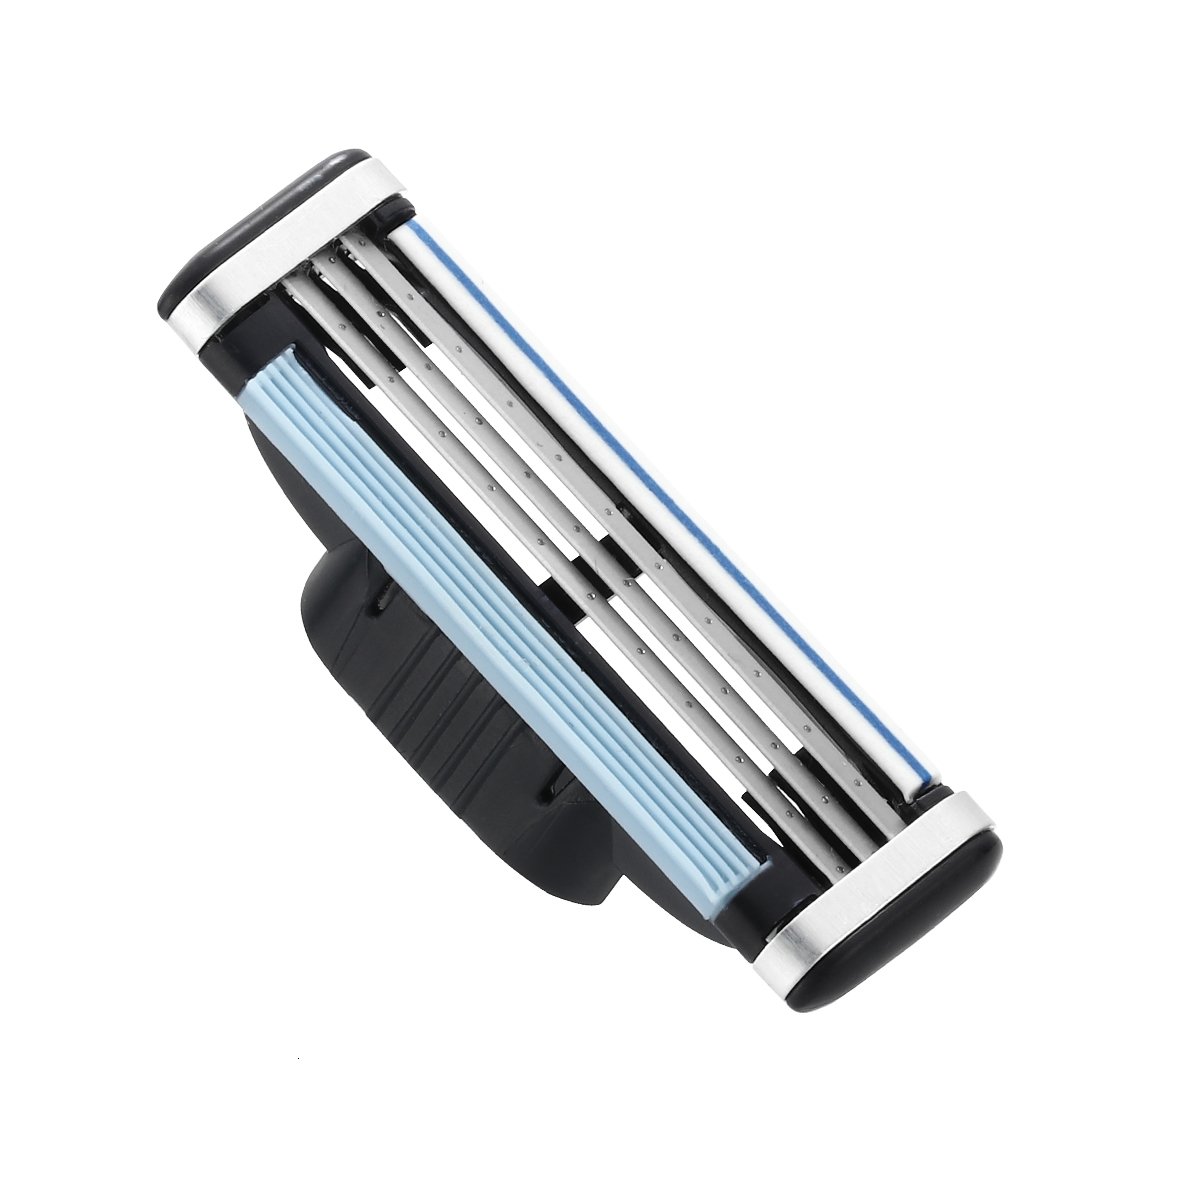 8pcs/lot 3 Layer Razor Blades For Men Gile Shaver Beauty Proglide Shaving Refills Cartridge Blades